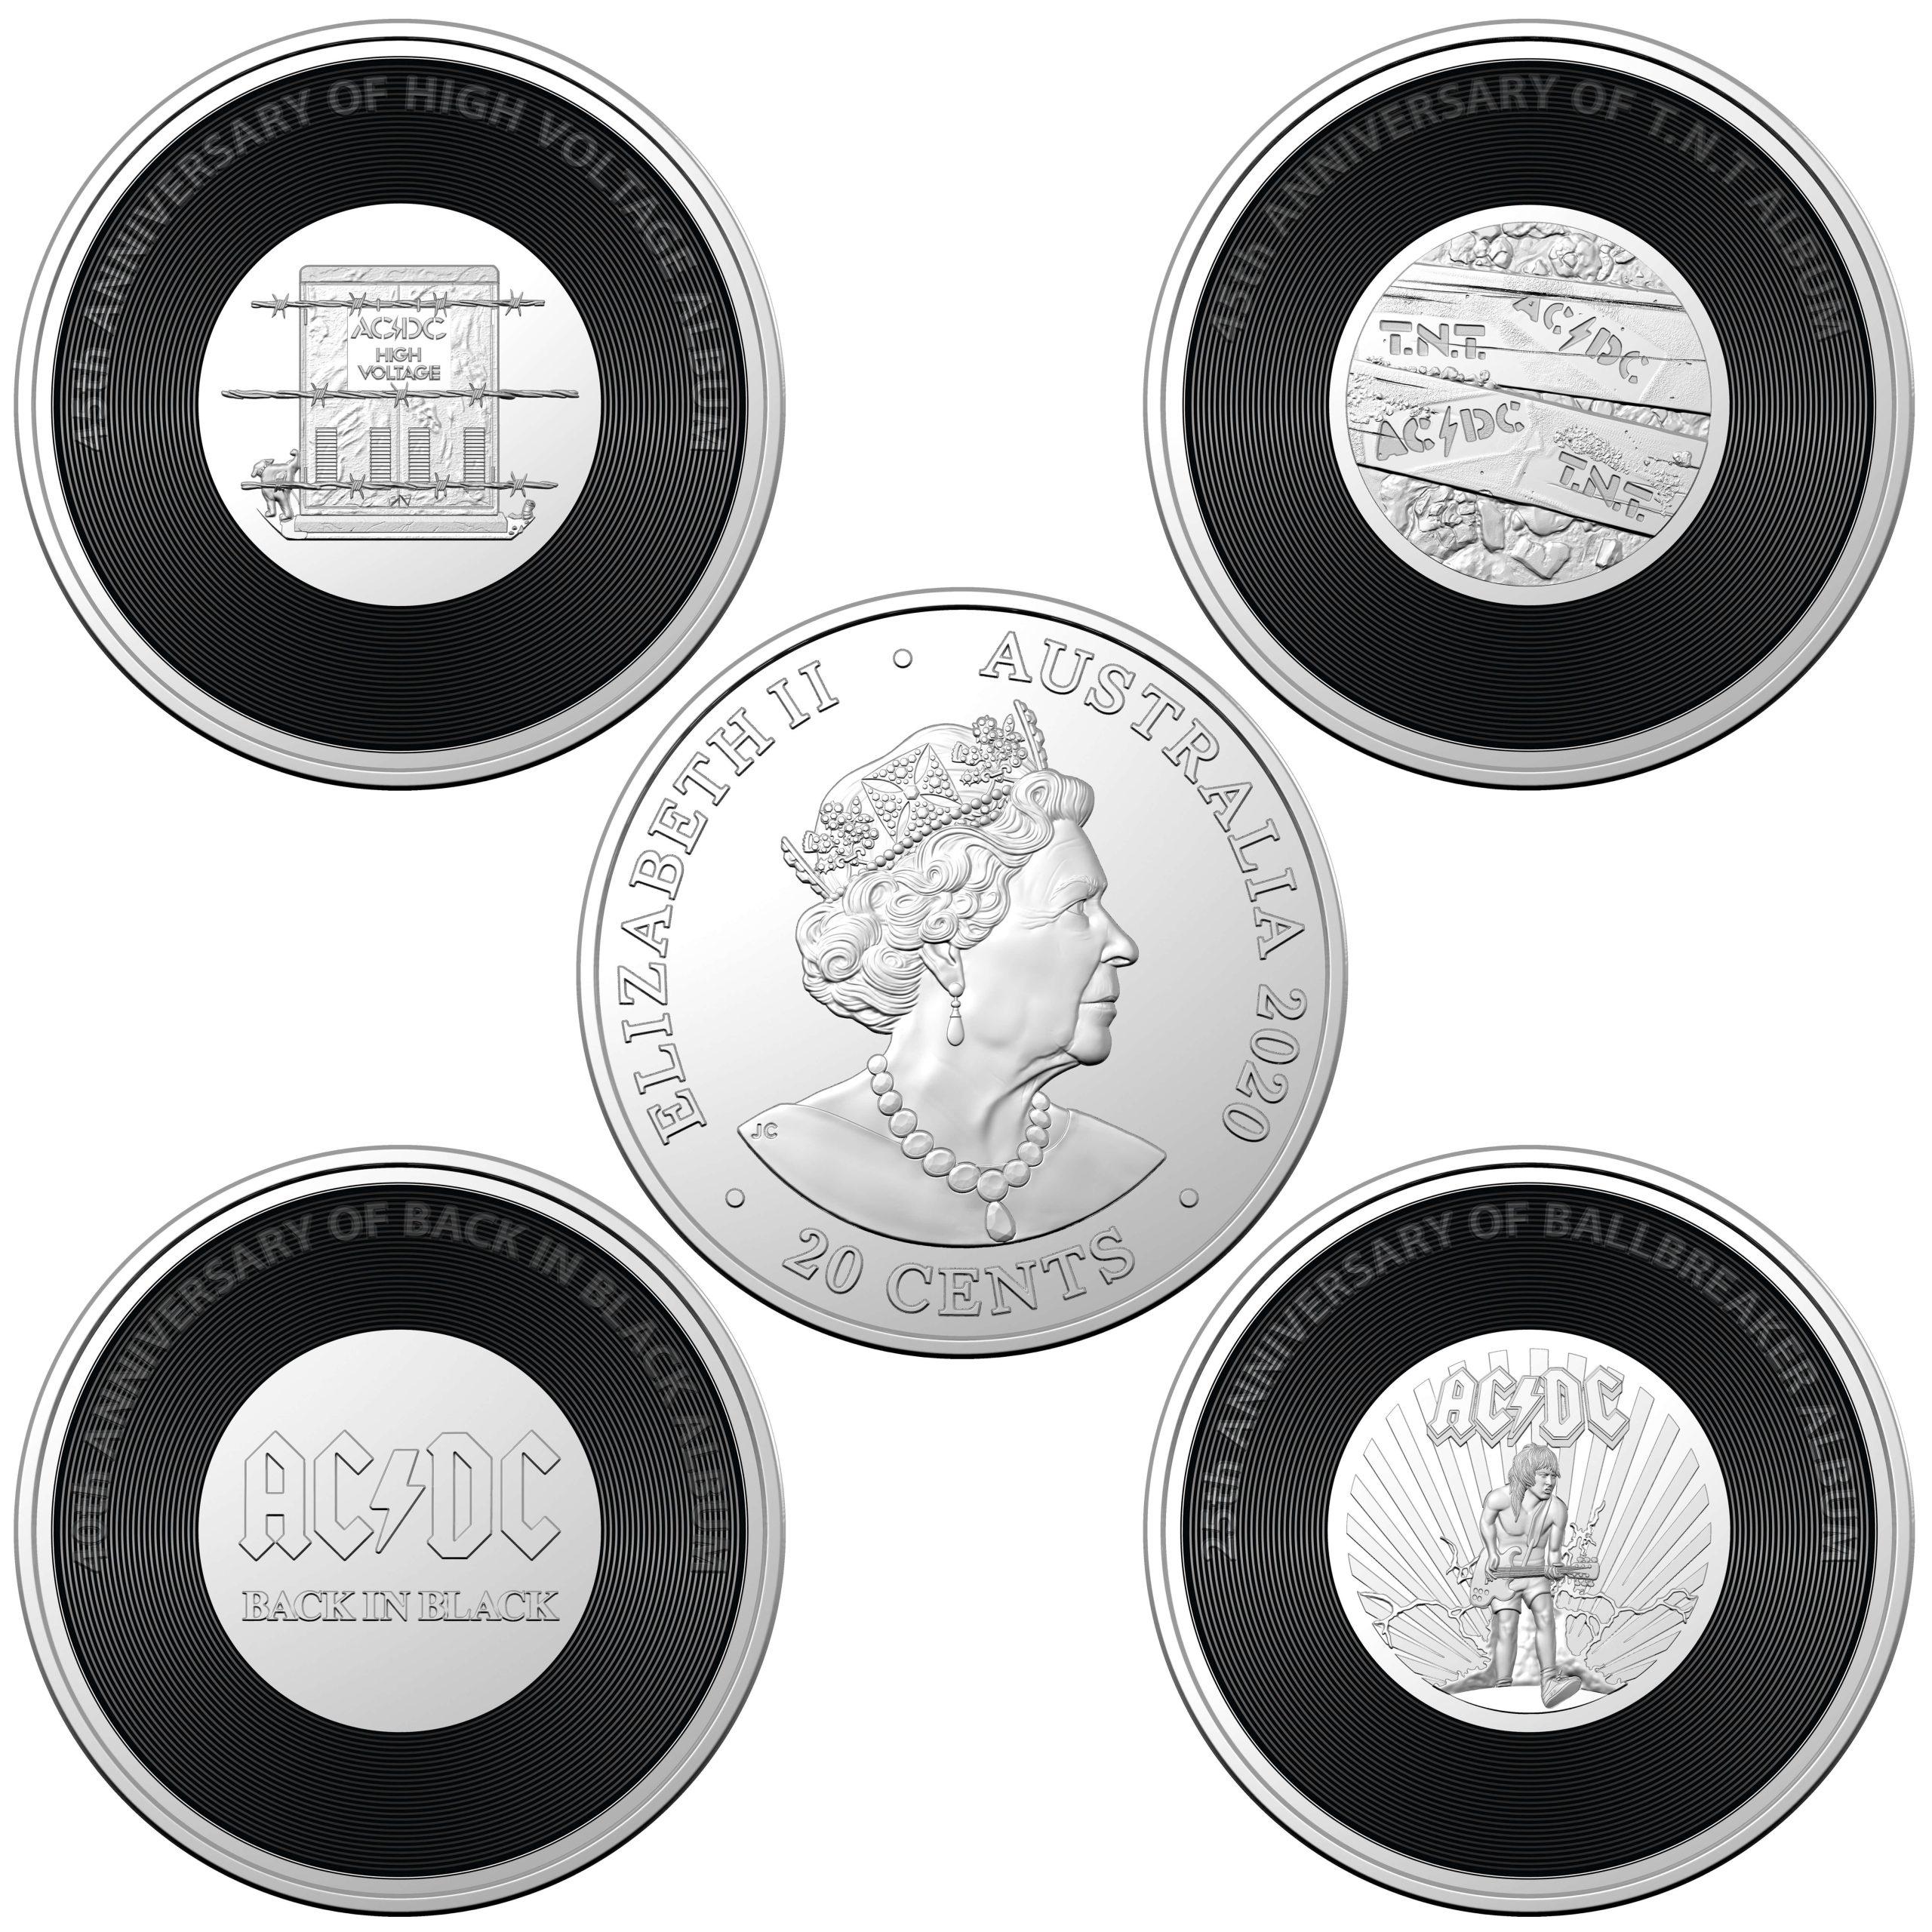 2020/2021 - AC/DC Seven Coin Collection - 20c Coloured CuNi Unc Coins 14